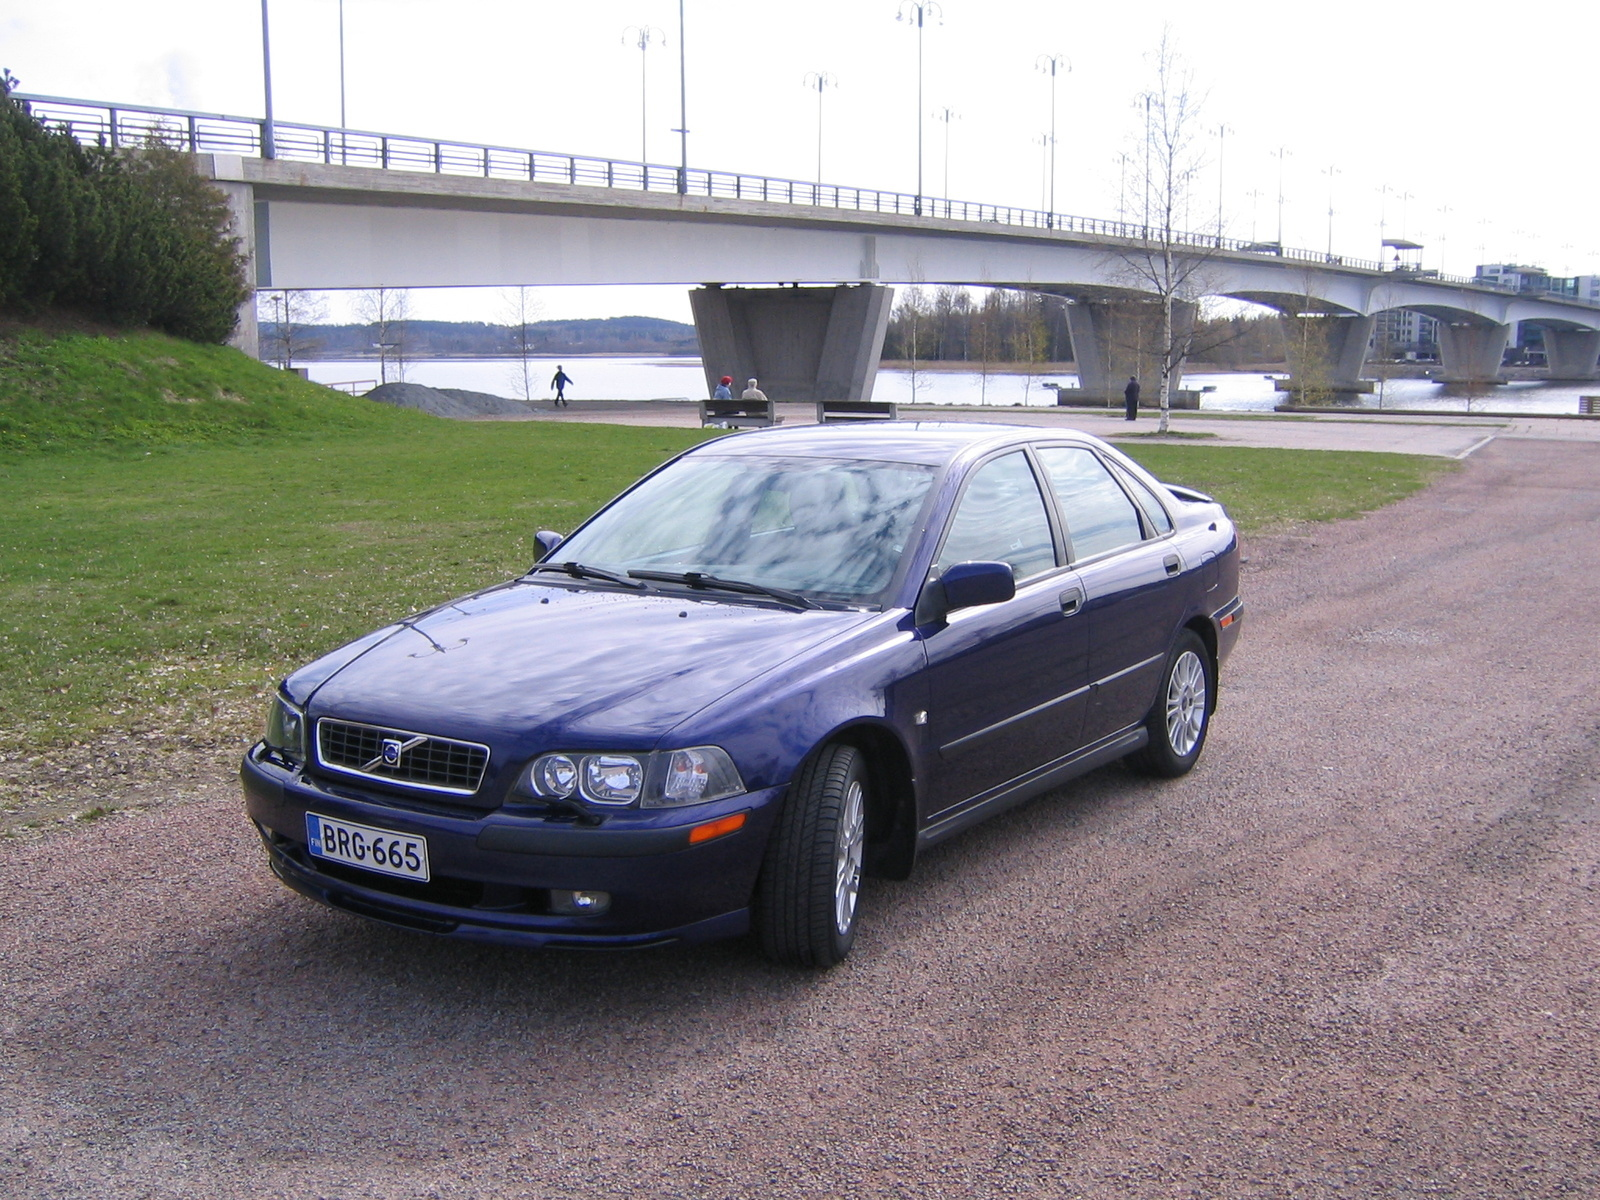 2002 volvo s40 overview cargurus rh cargurus com 2000 Volvo S80 Interior 2000 Volvo S40 1.9T